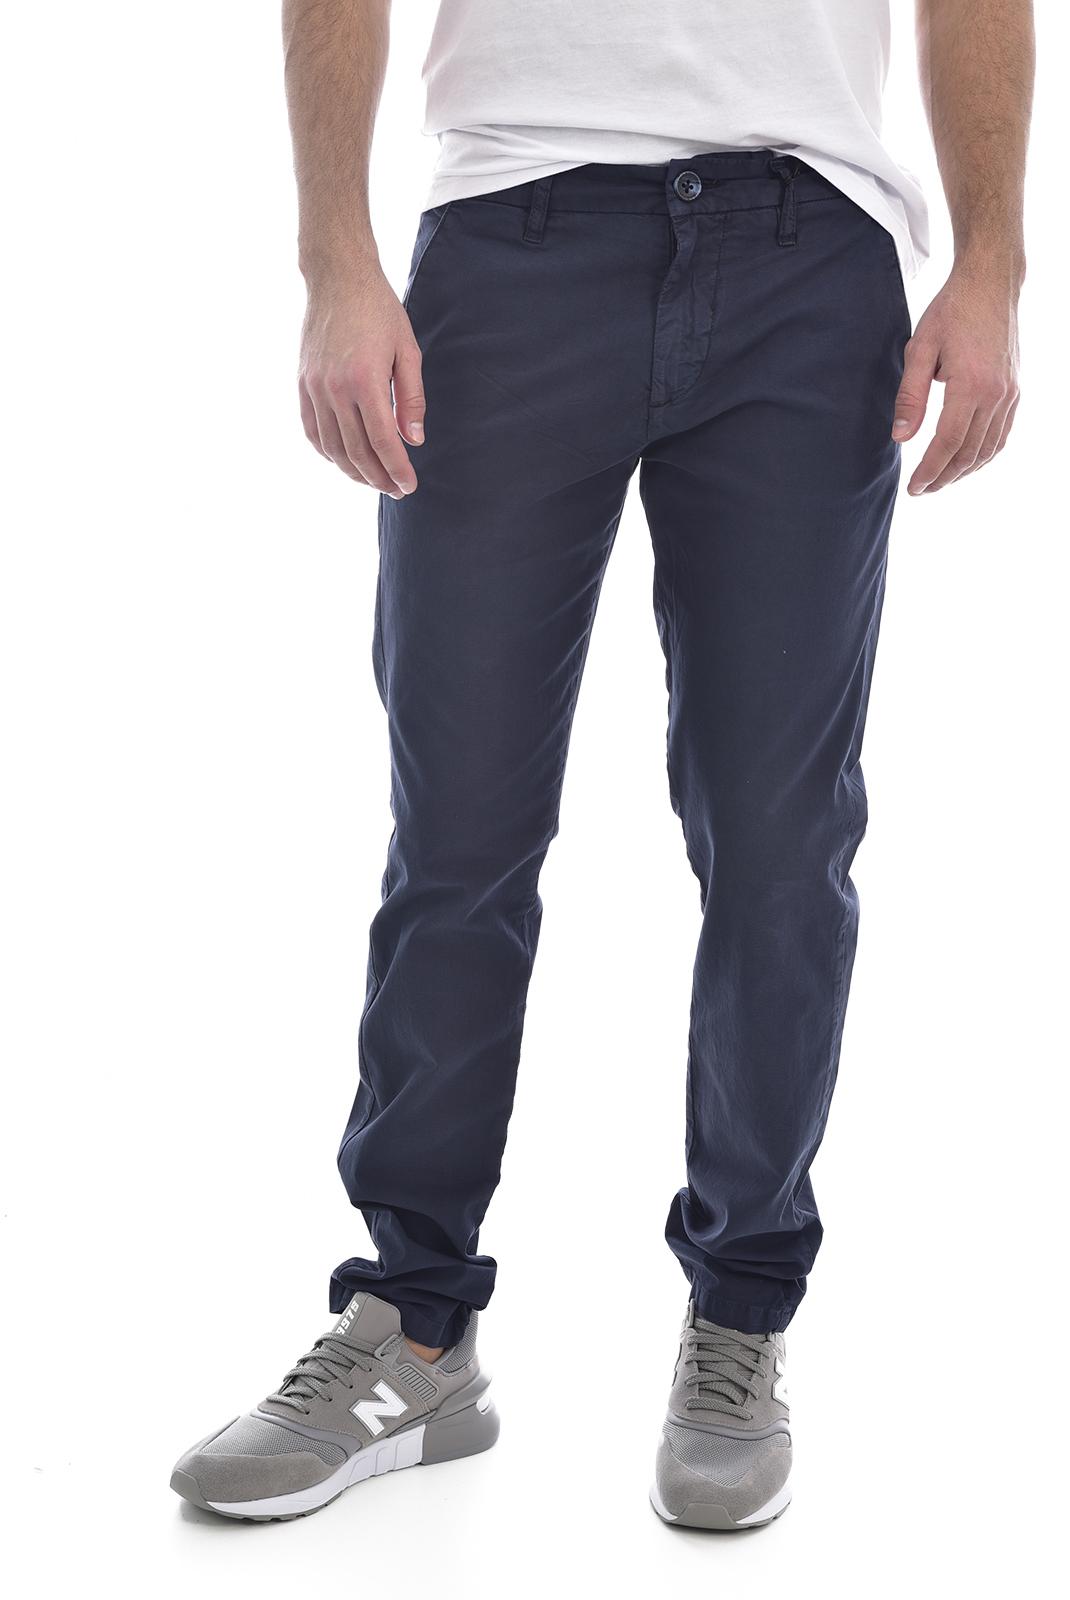 Pantalons chino/citadin  Guess jeans M02B26 WCRK1 MYRON G720 BLUE NAVY